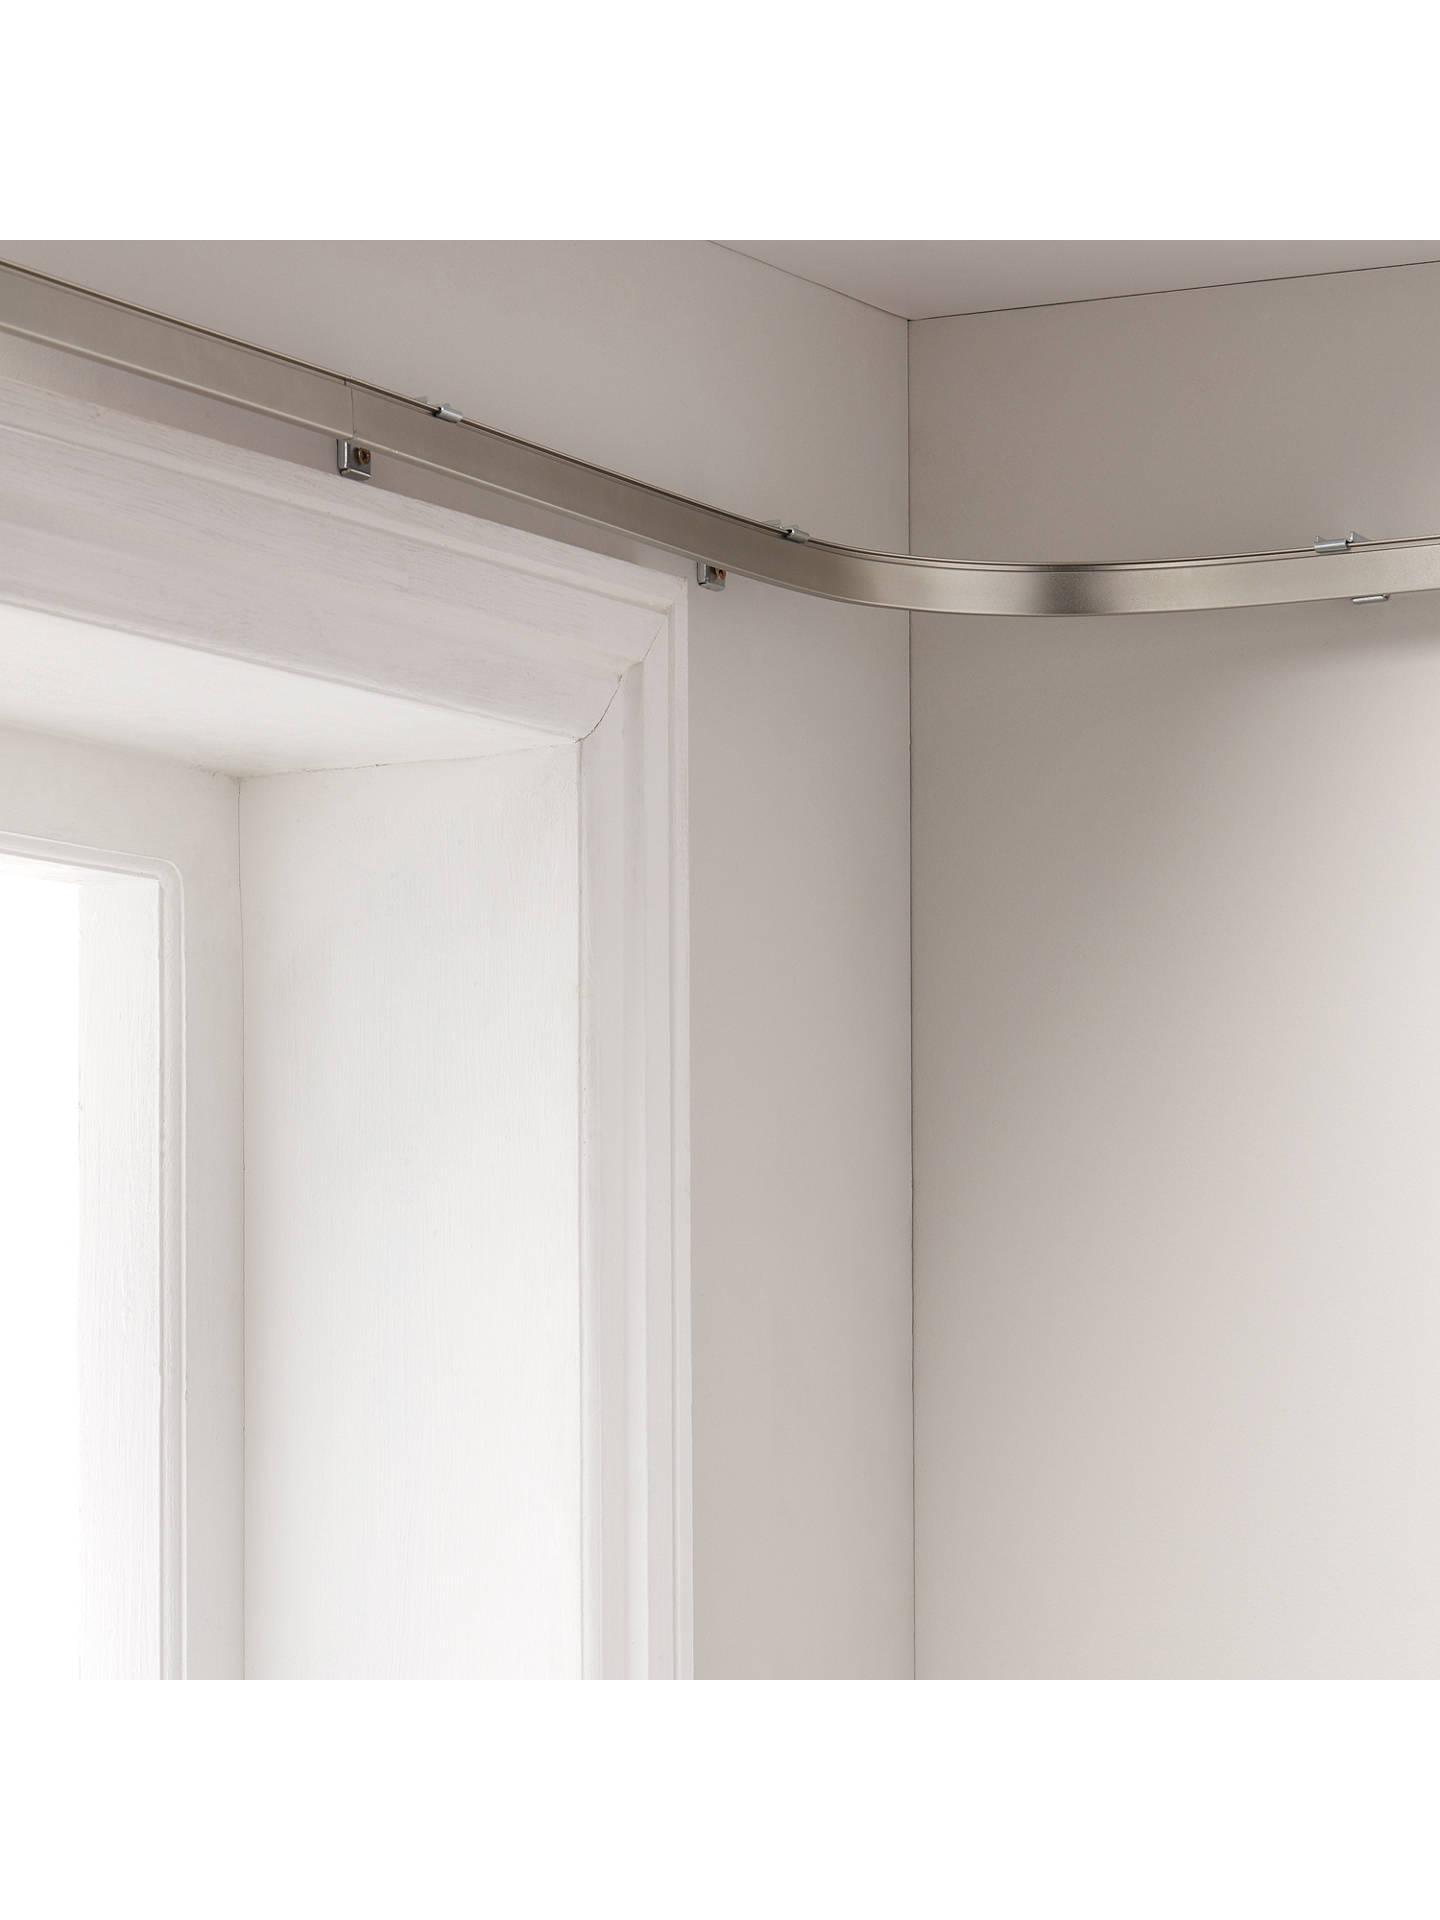 Bendable metal pole